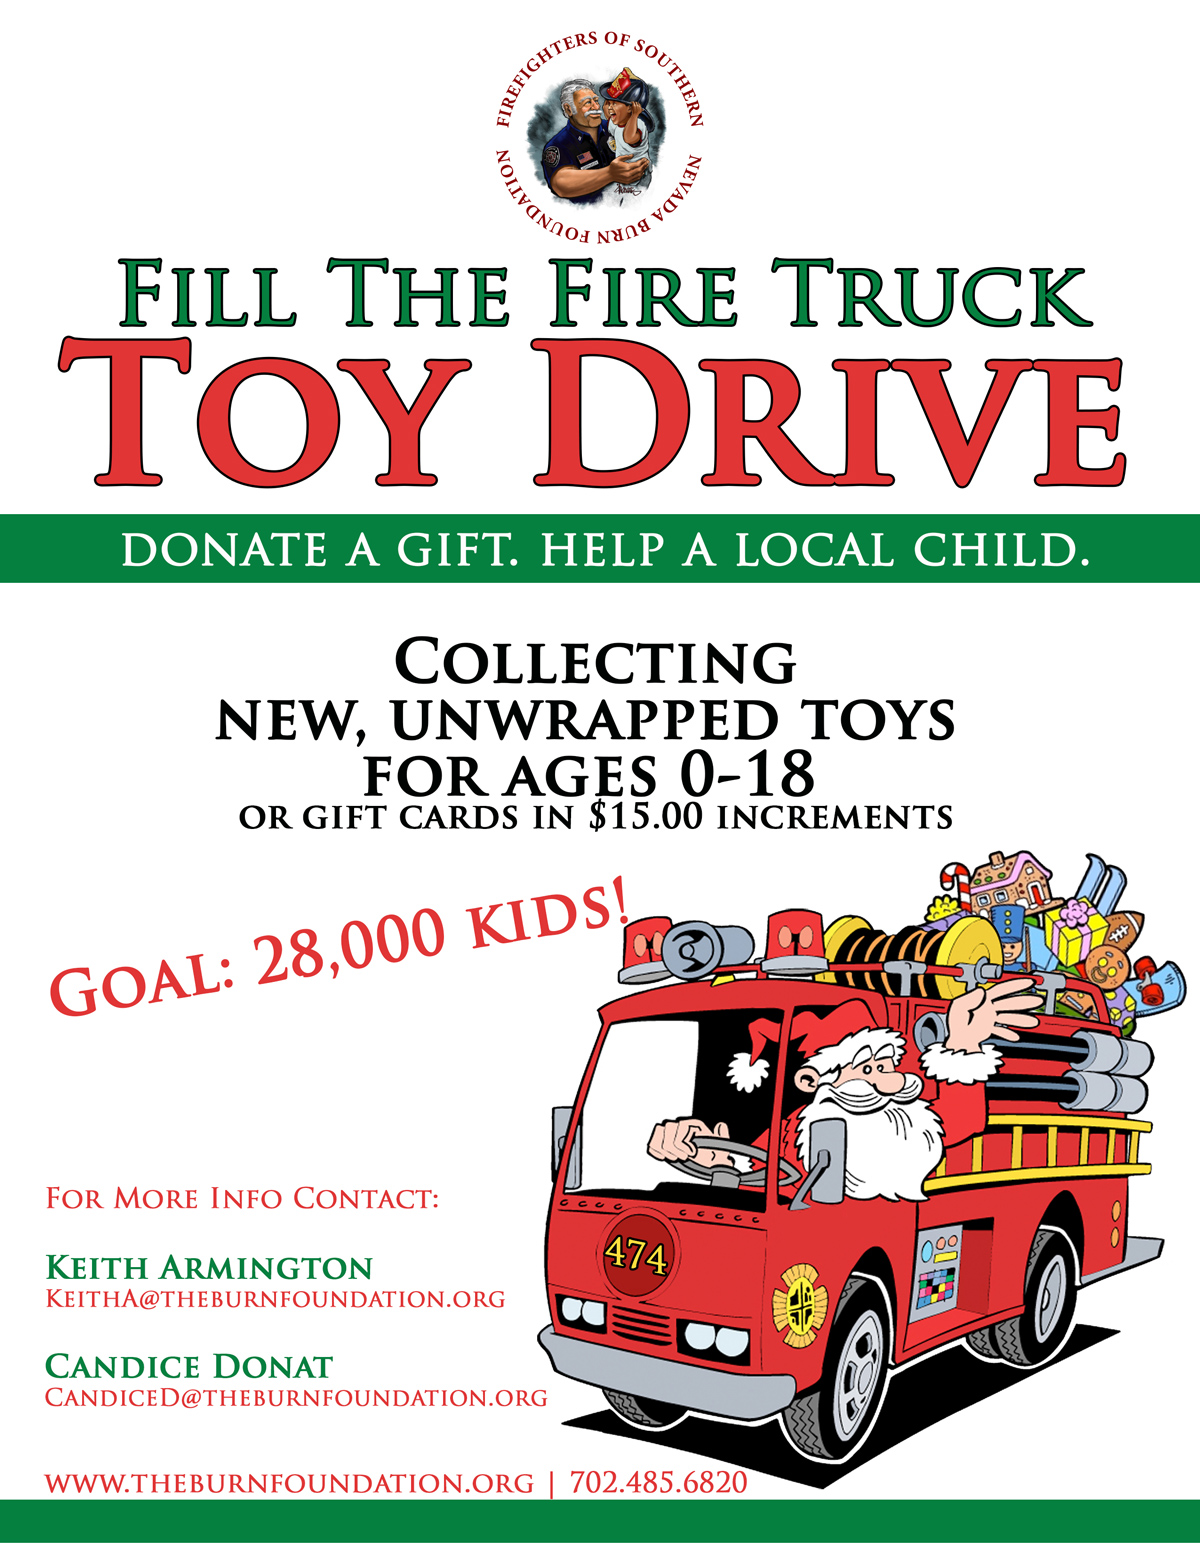 2017 Toy Drive Flyer Boulder City, NV